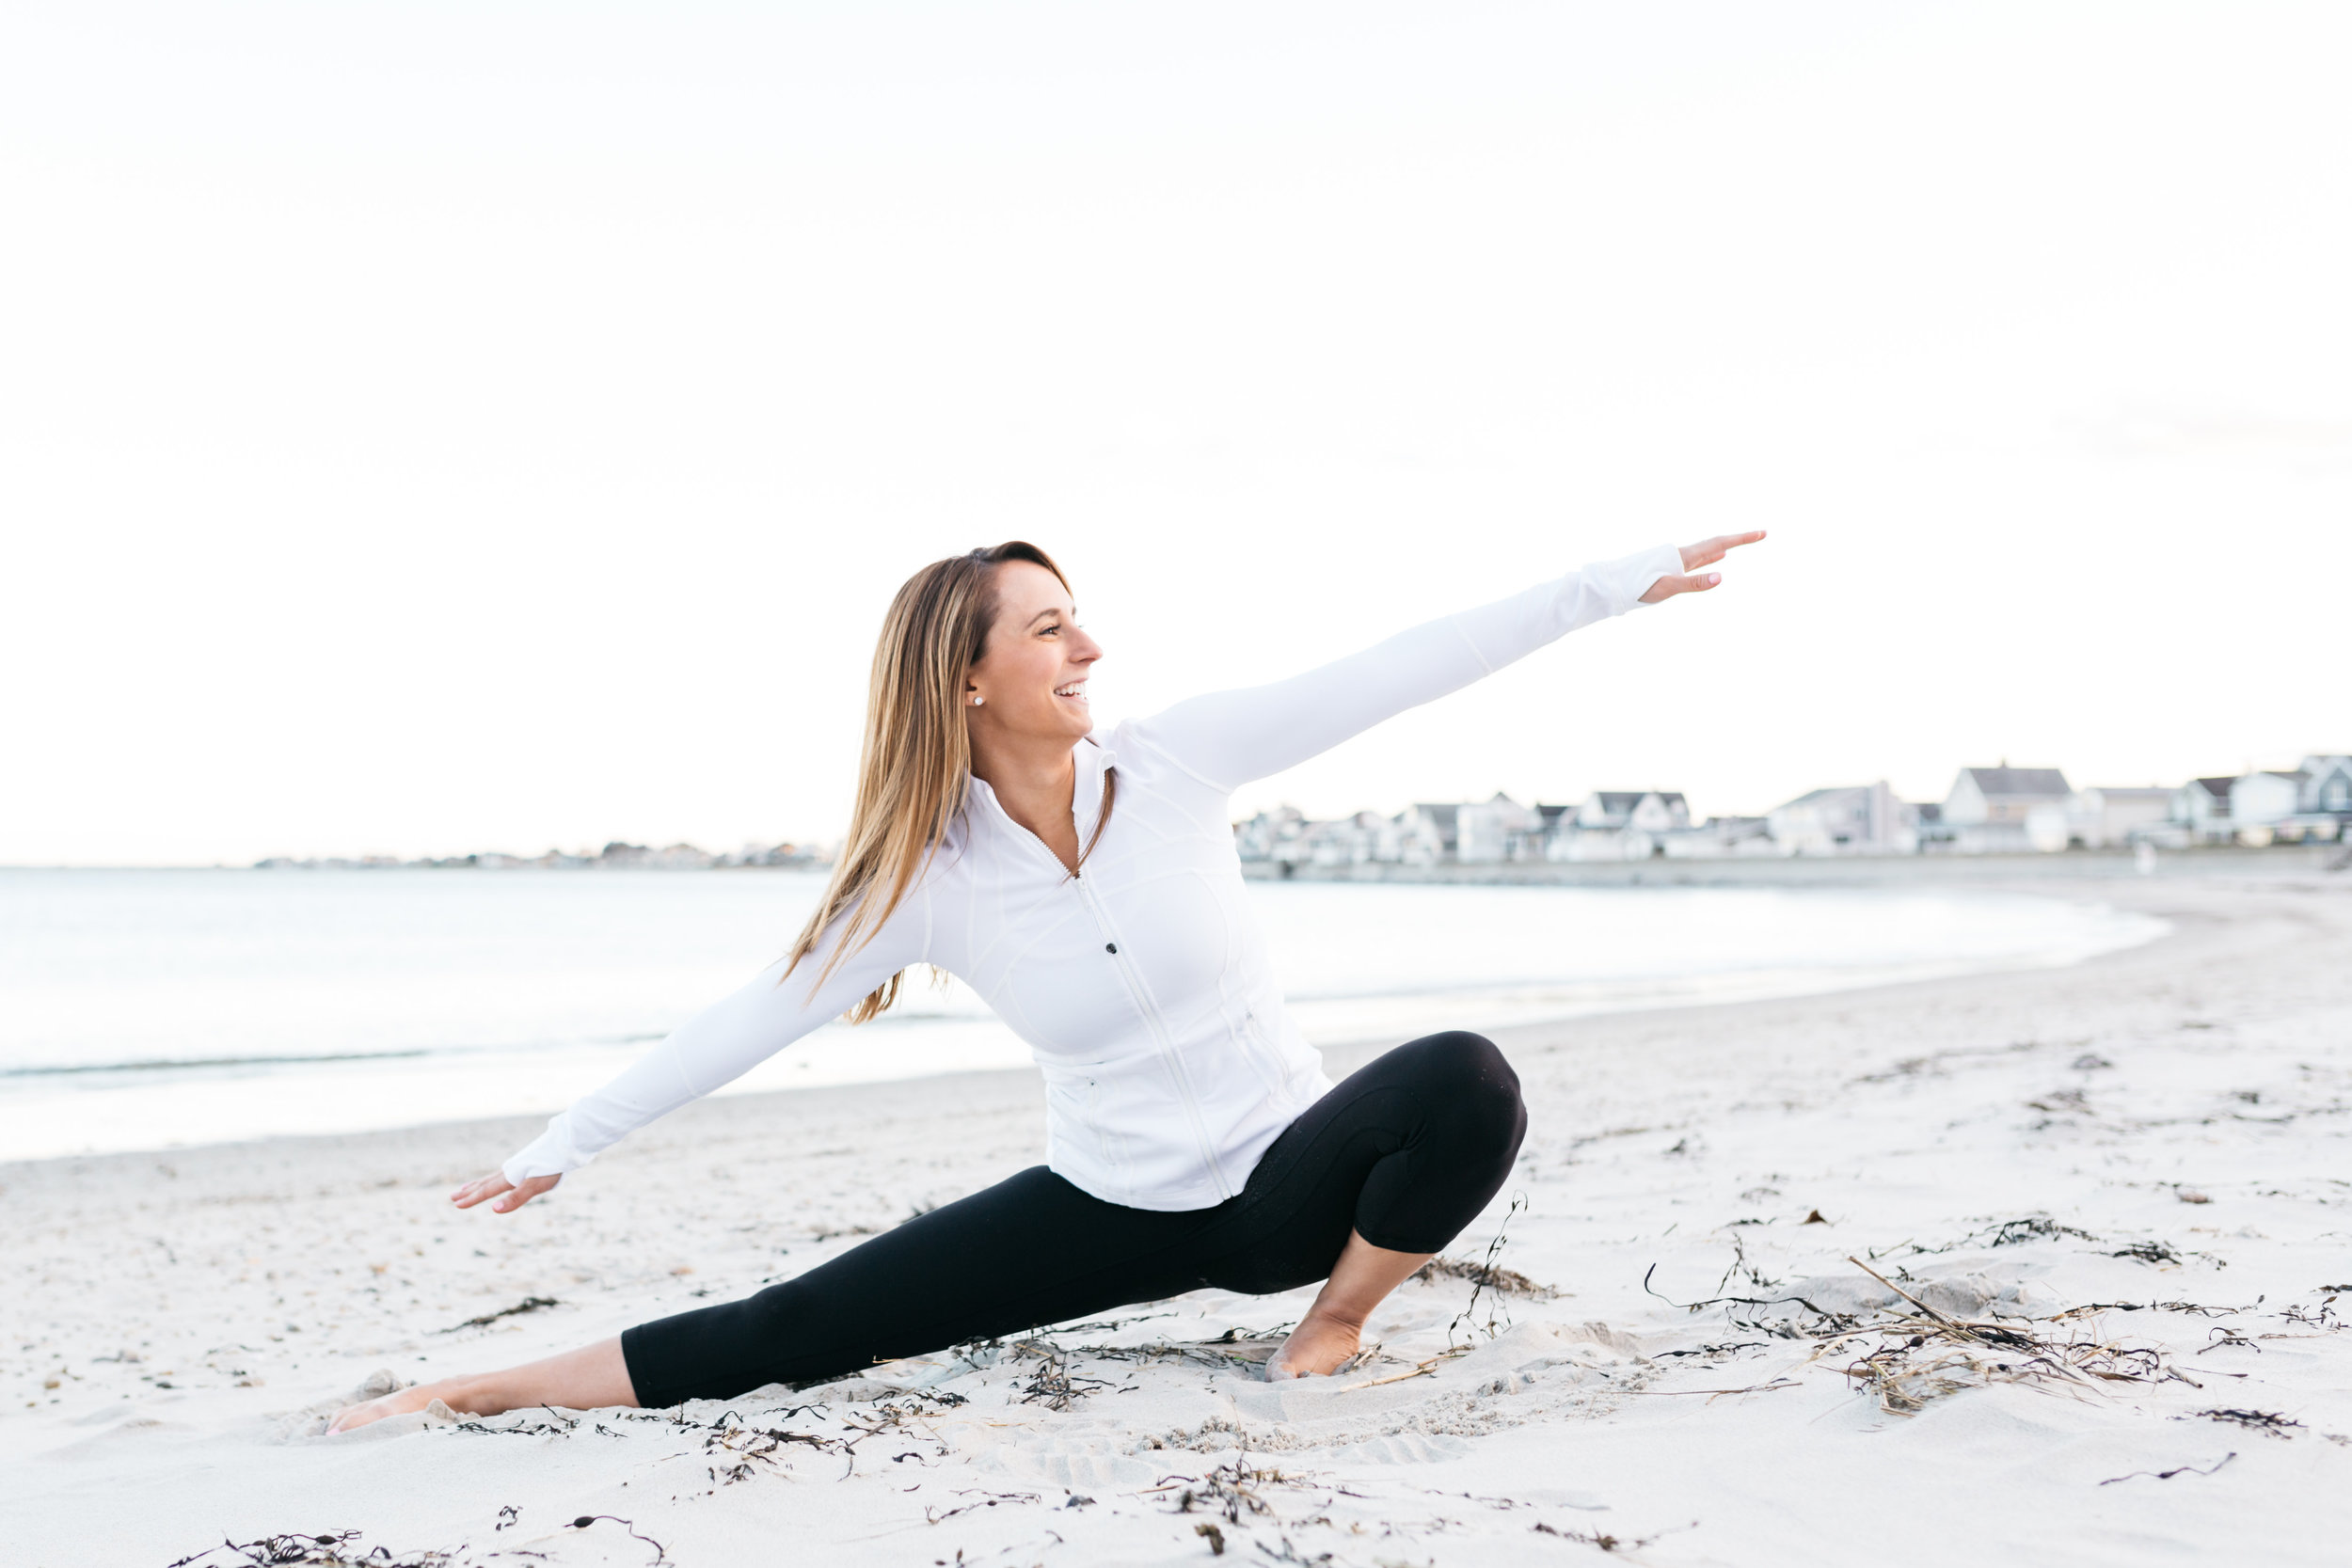 boston-yoga-photographer-kerry-13.jpg